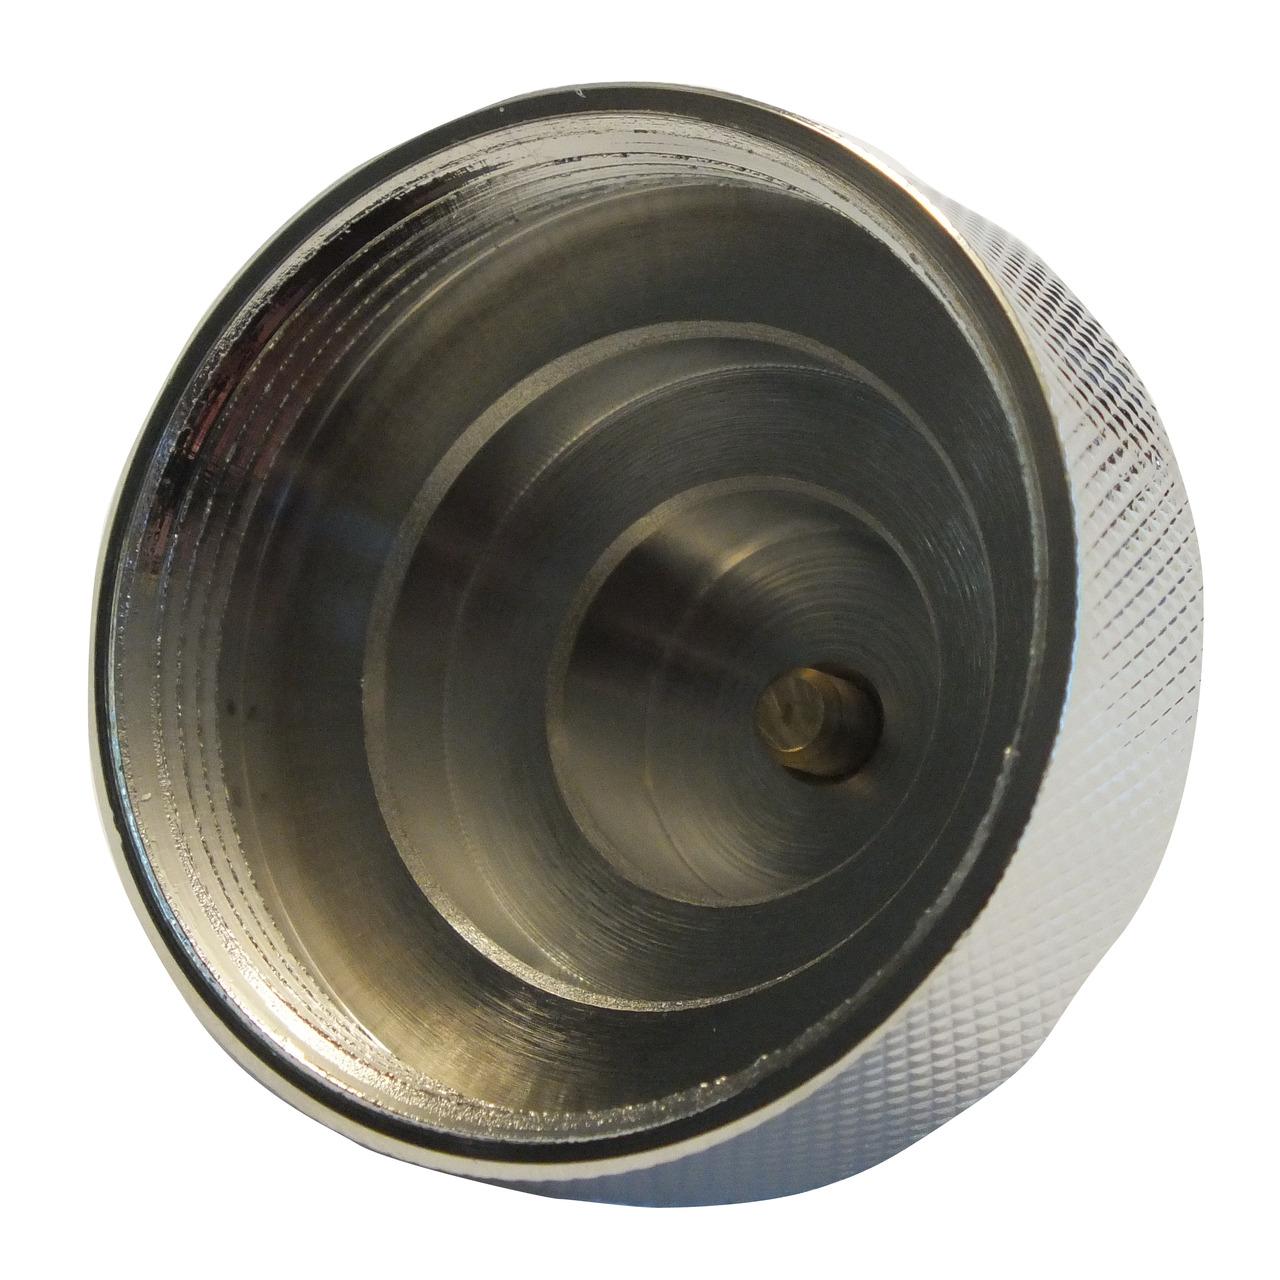 Adapter für Heizungsventil Meges M38 x 1-5 mm (Messing)